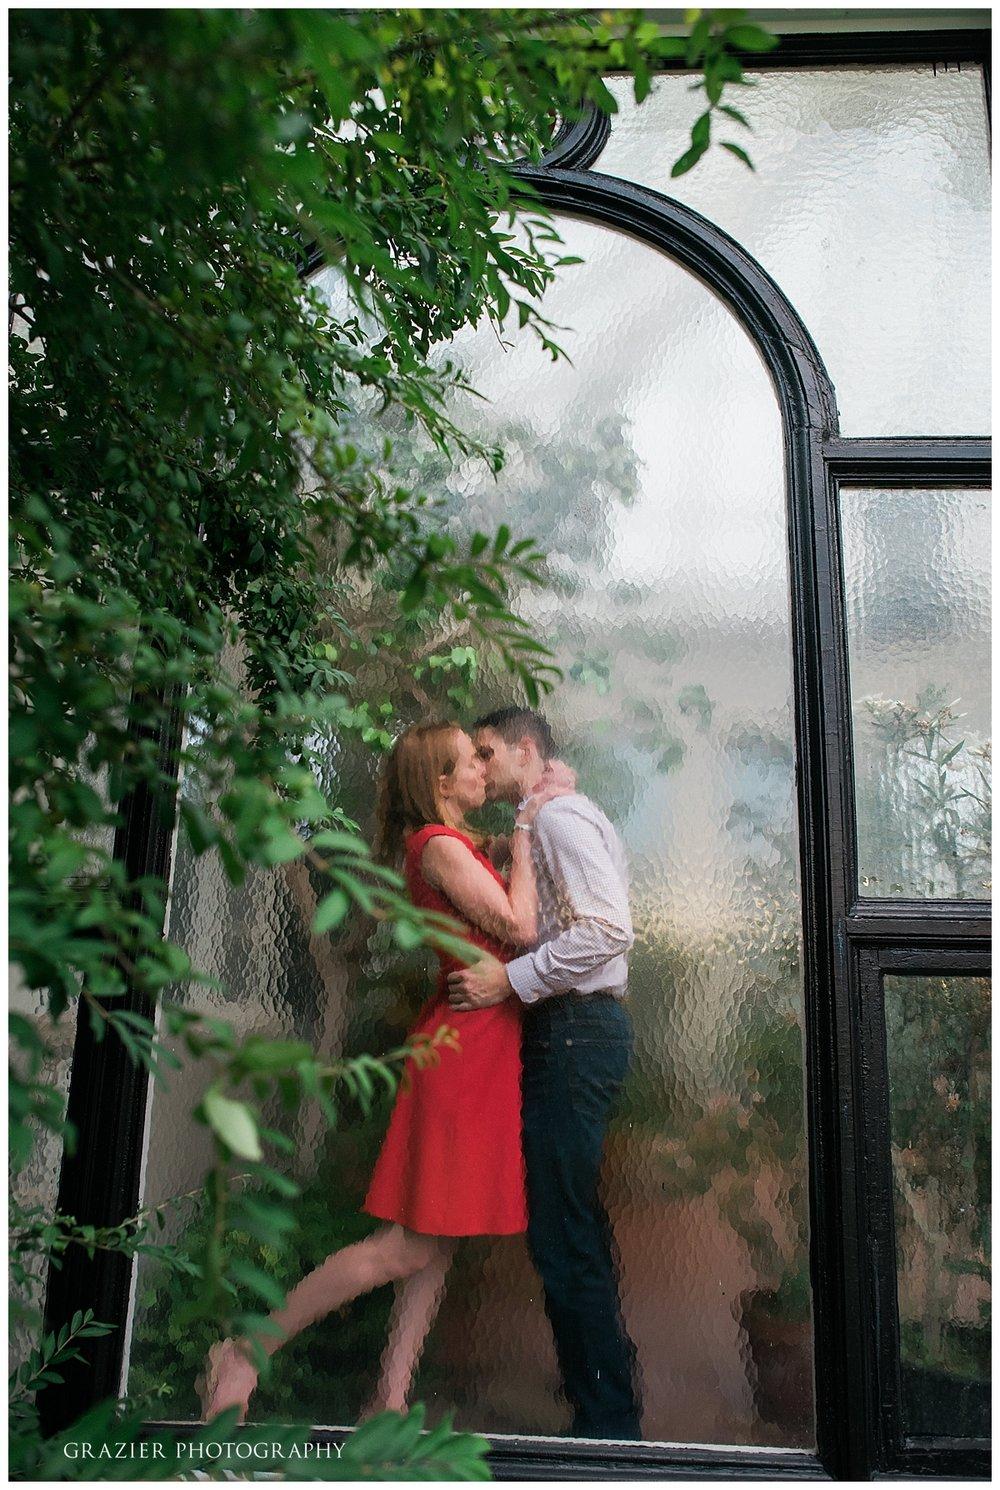 Boston Engagement Wedding Grazier Photography 180623-30_WEB.jpg